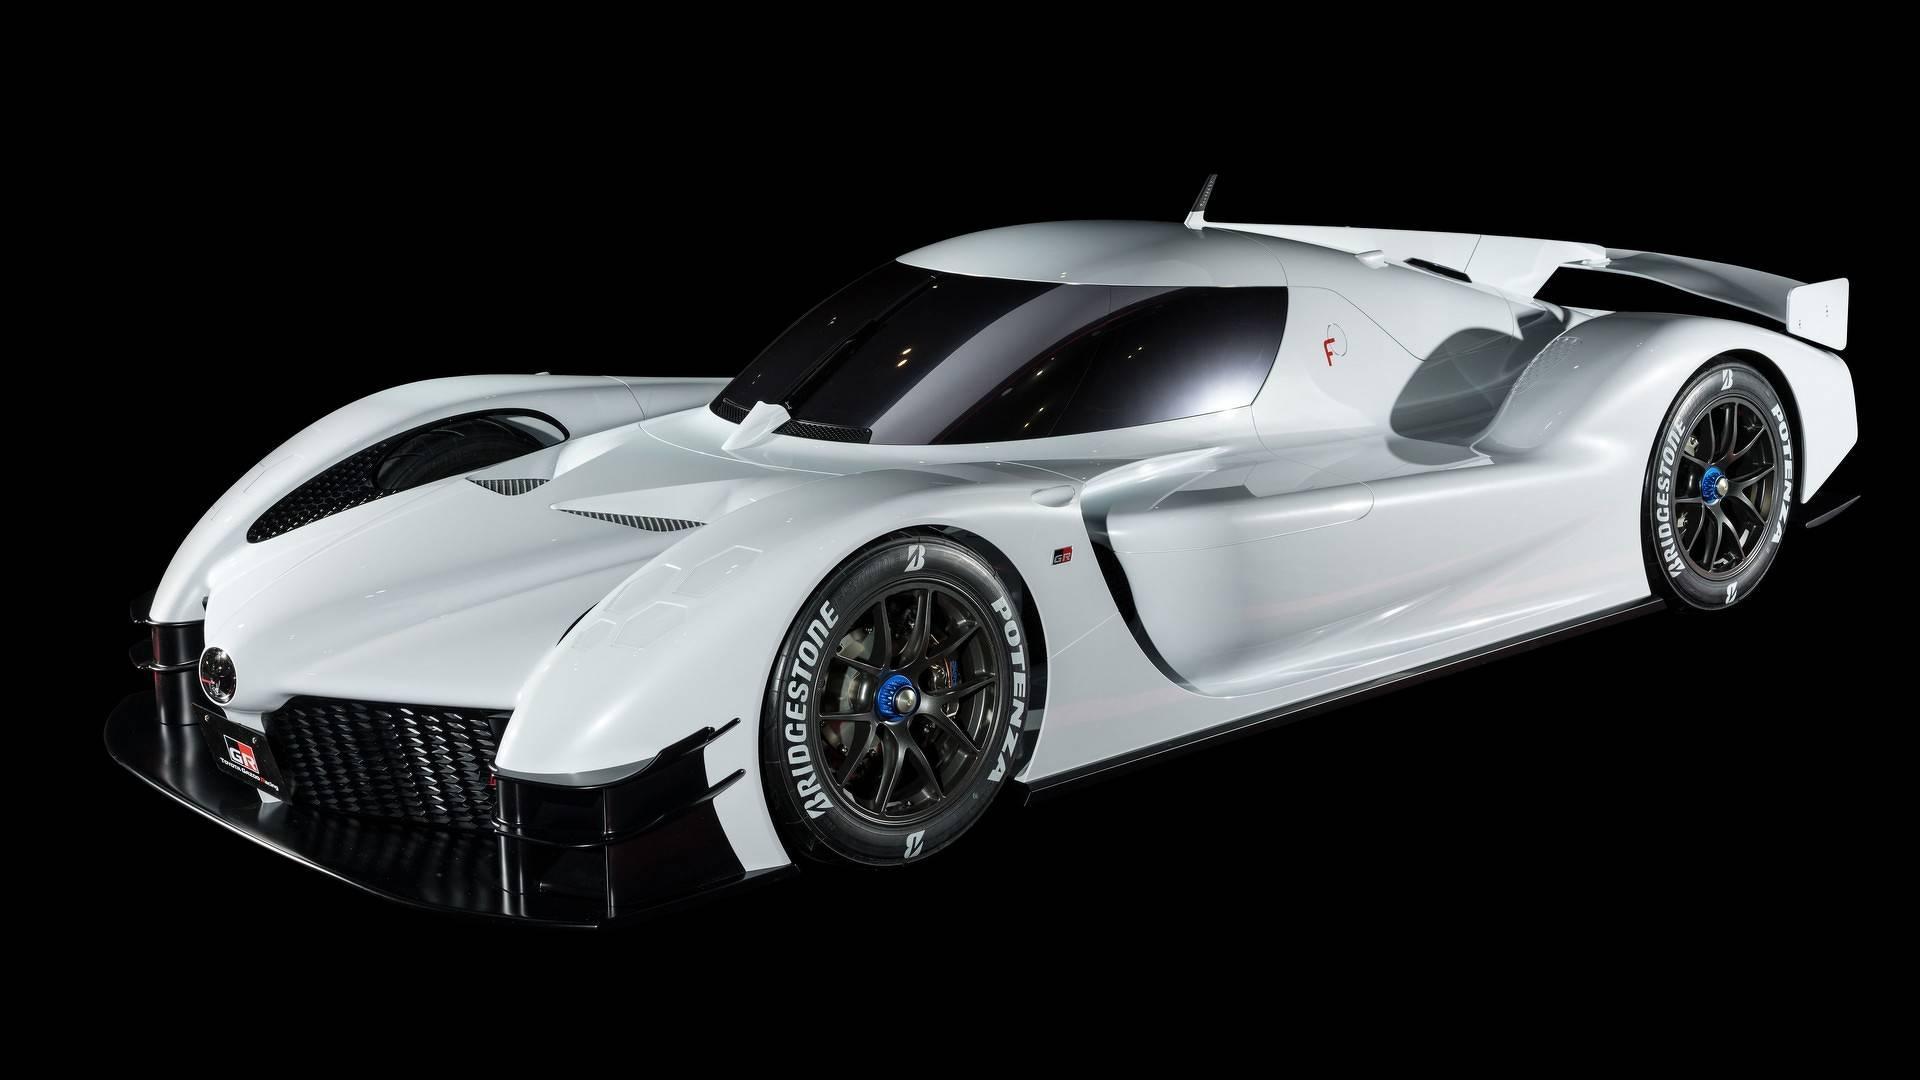 Toyota-GR-Super-Sport-Concept-2018-5.jpg